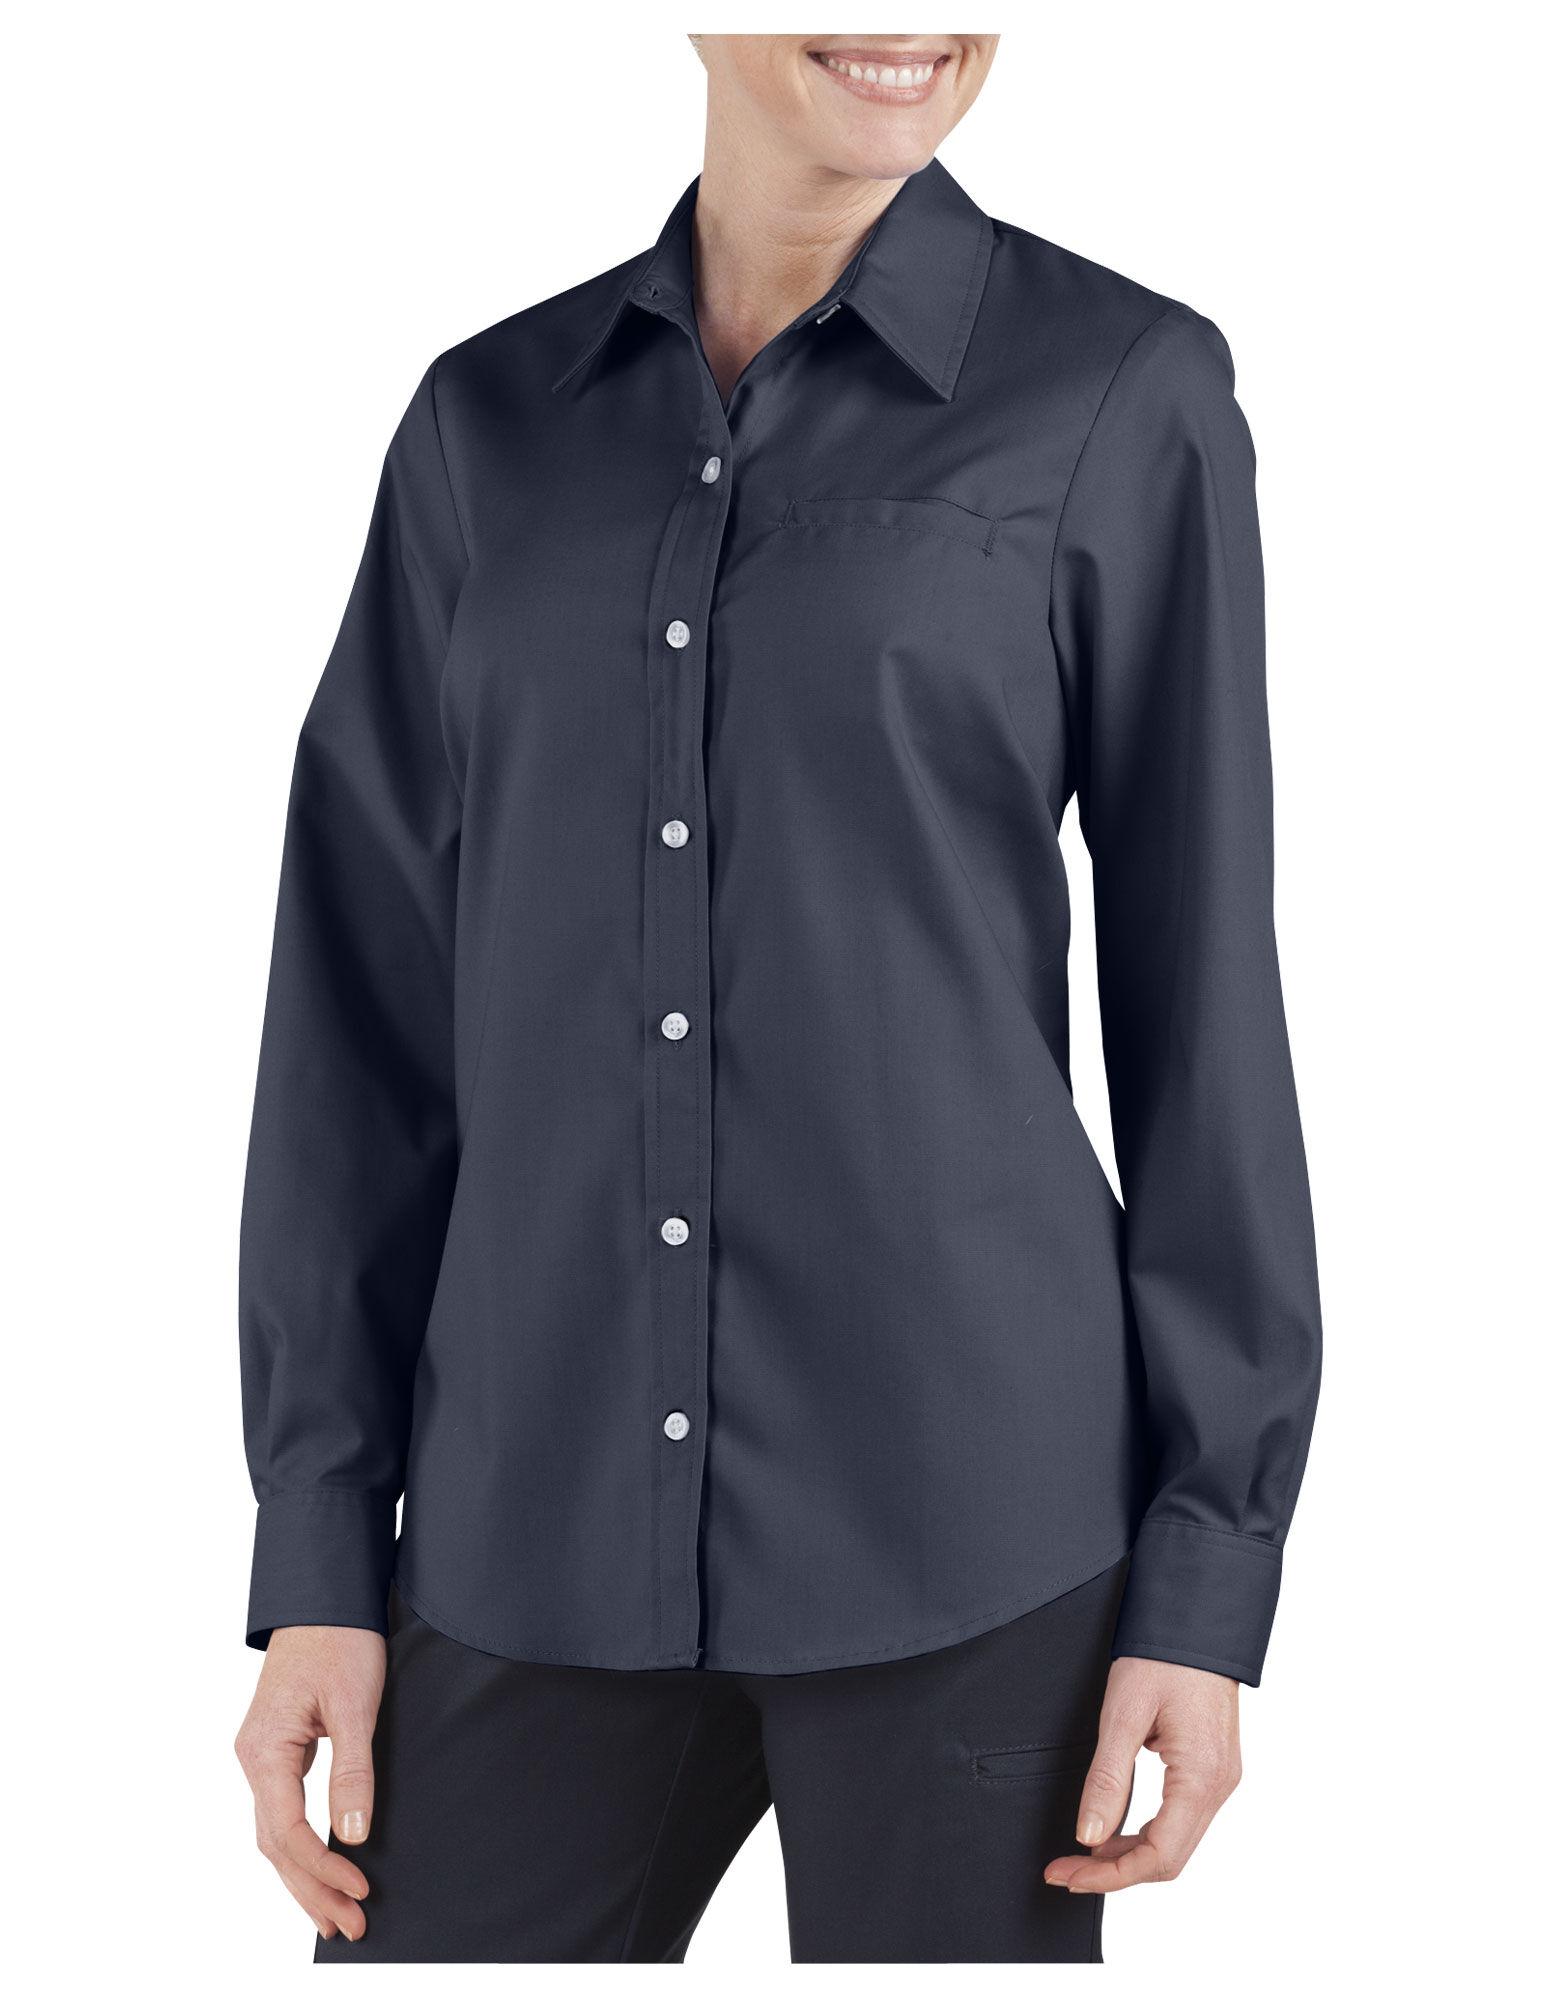 Women 39 s long sleeve stretch poplin shirt womens tops for Long sleeve poplin shirt